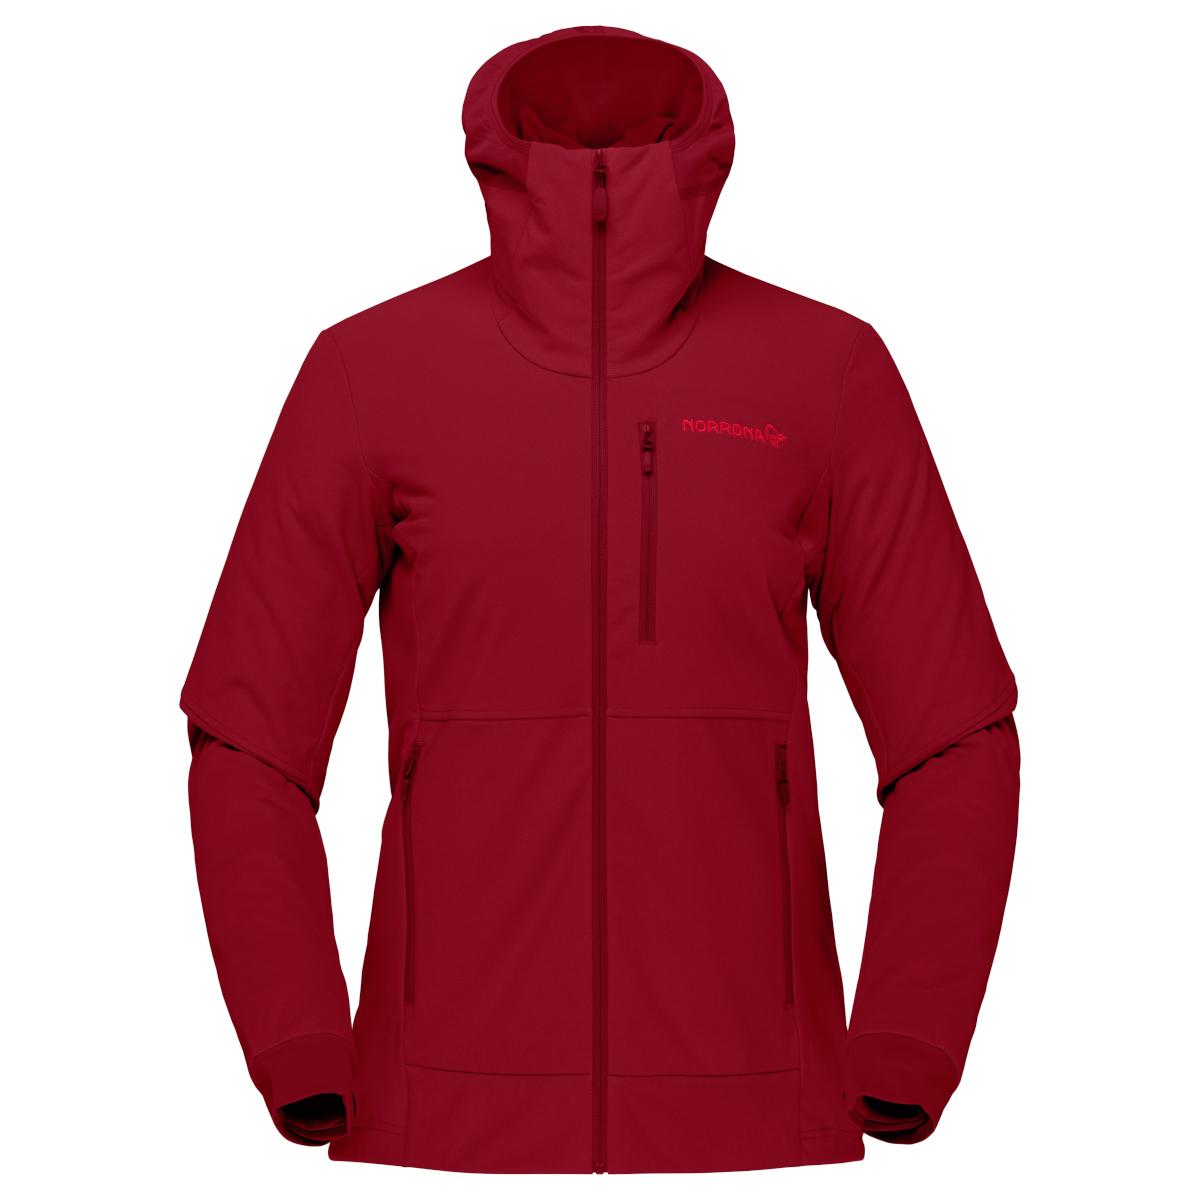 Norrona hiloflex200 Hood Jacket Women - Rhubarb